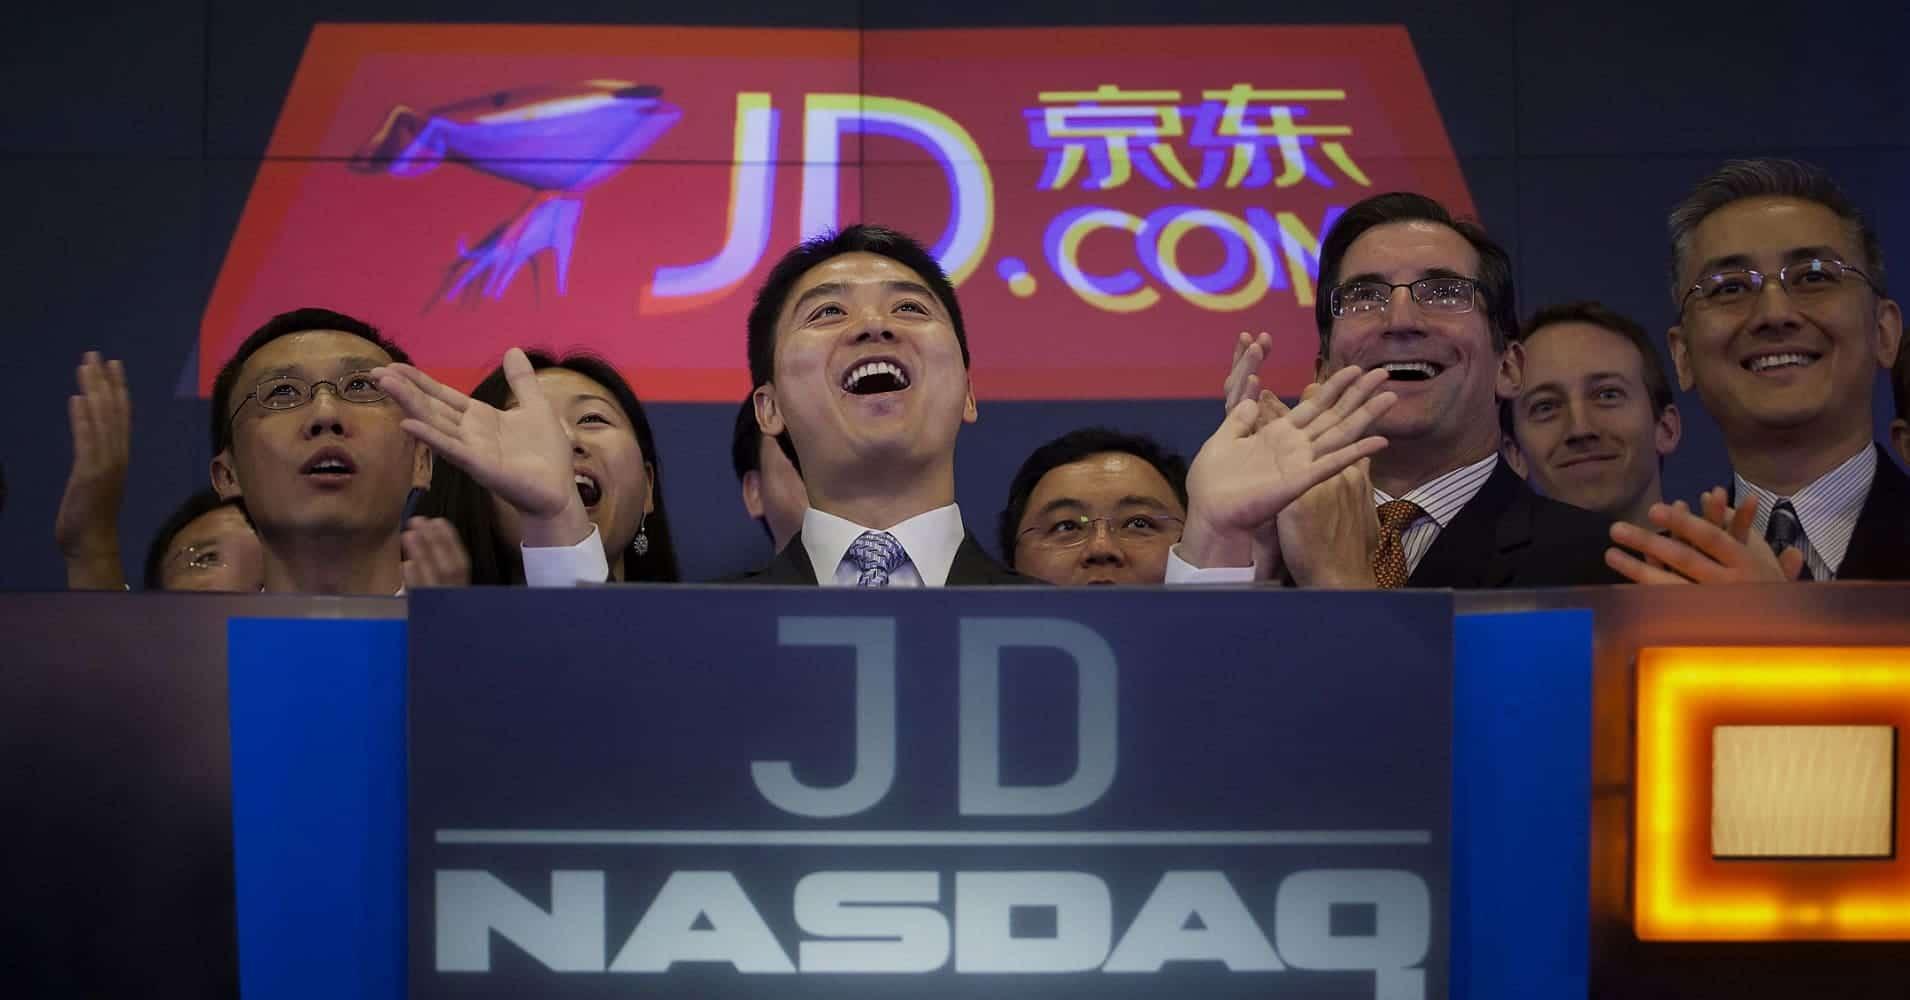 China Concepts Stocks, JD Nasdaq